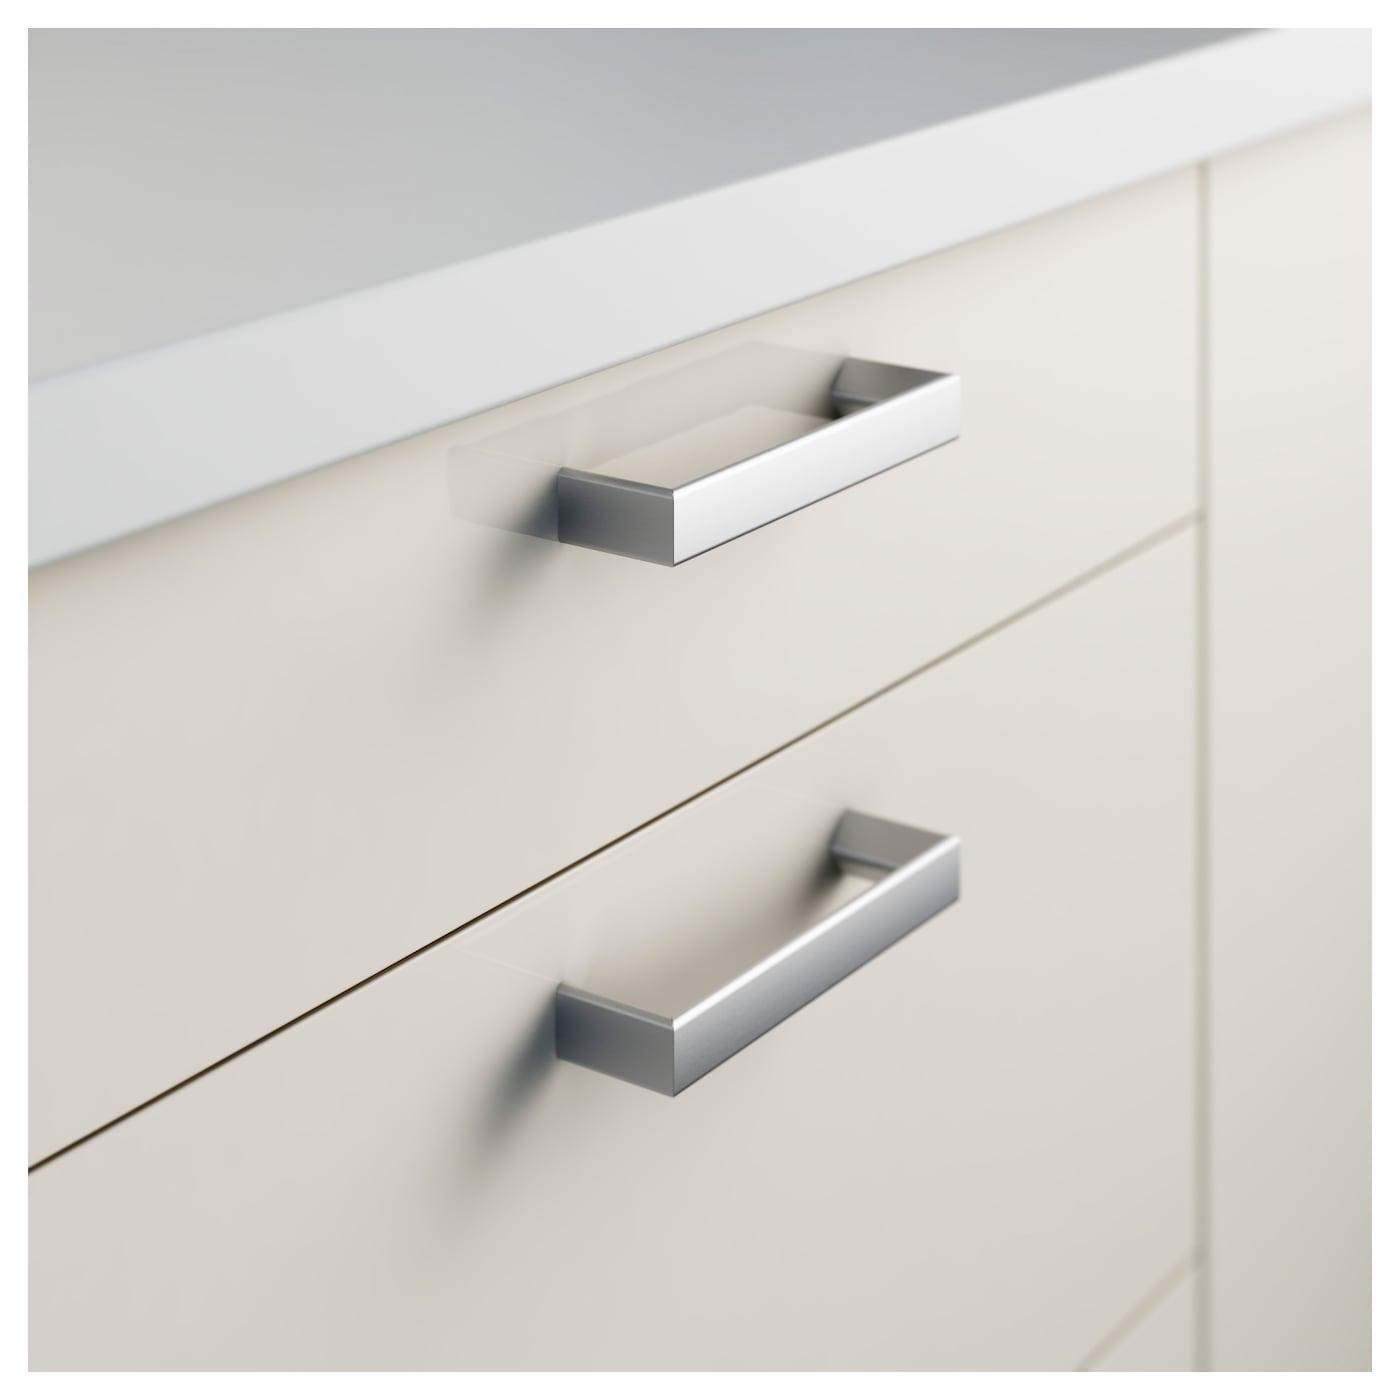 Cabinet Hardware - Knobs & Handles - IKEA